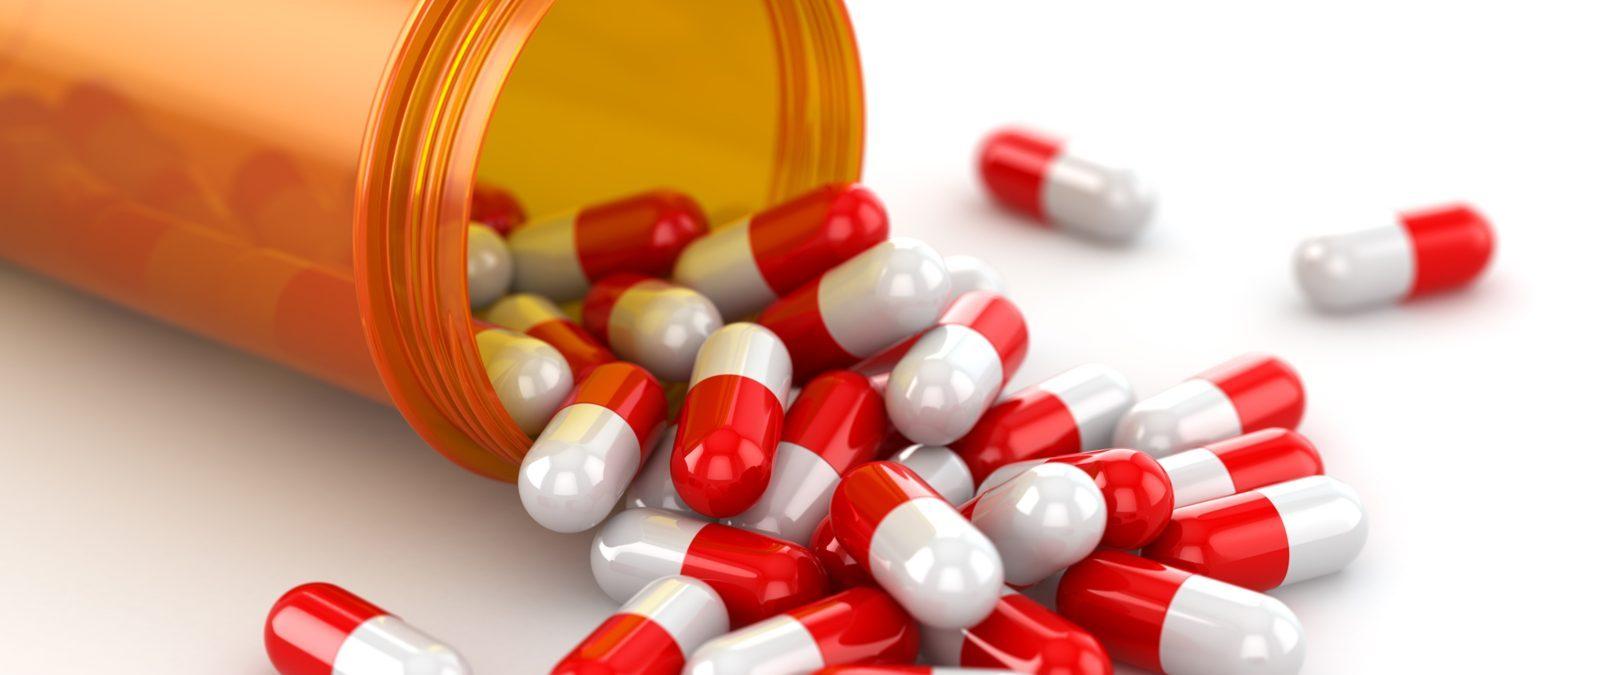 Resistencia antibiótica, la próxima gran epidemia mundial